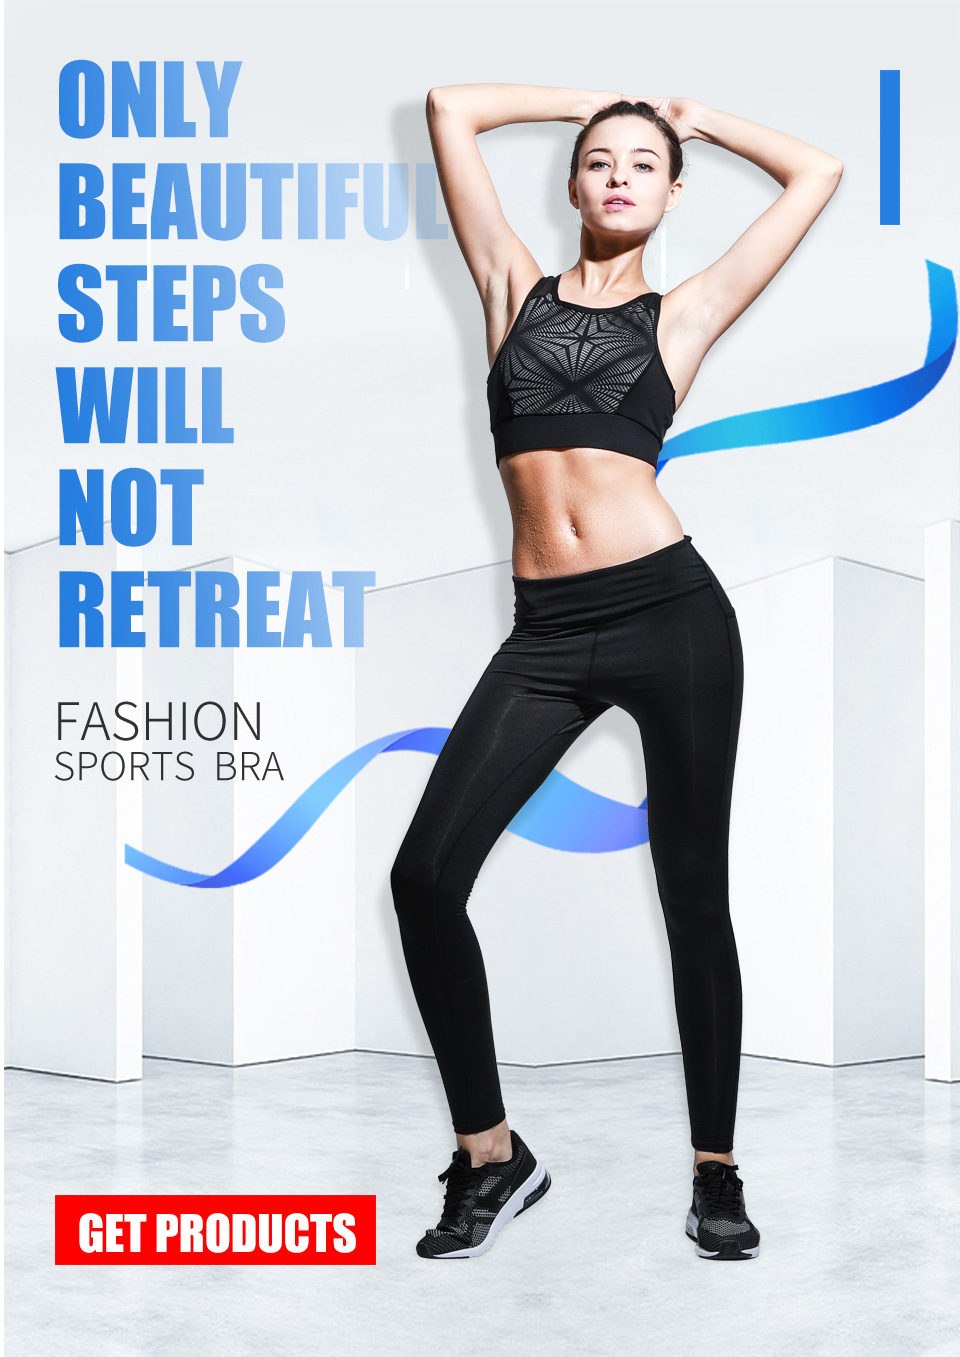 7d6e0712aa841 New Reflective Push Up Fitness Sport Bra High Support Shockproof Women  Brassiere Sports Top Yoga Fitness Running Gym Sportswear